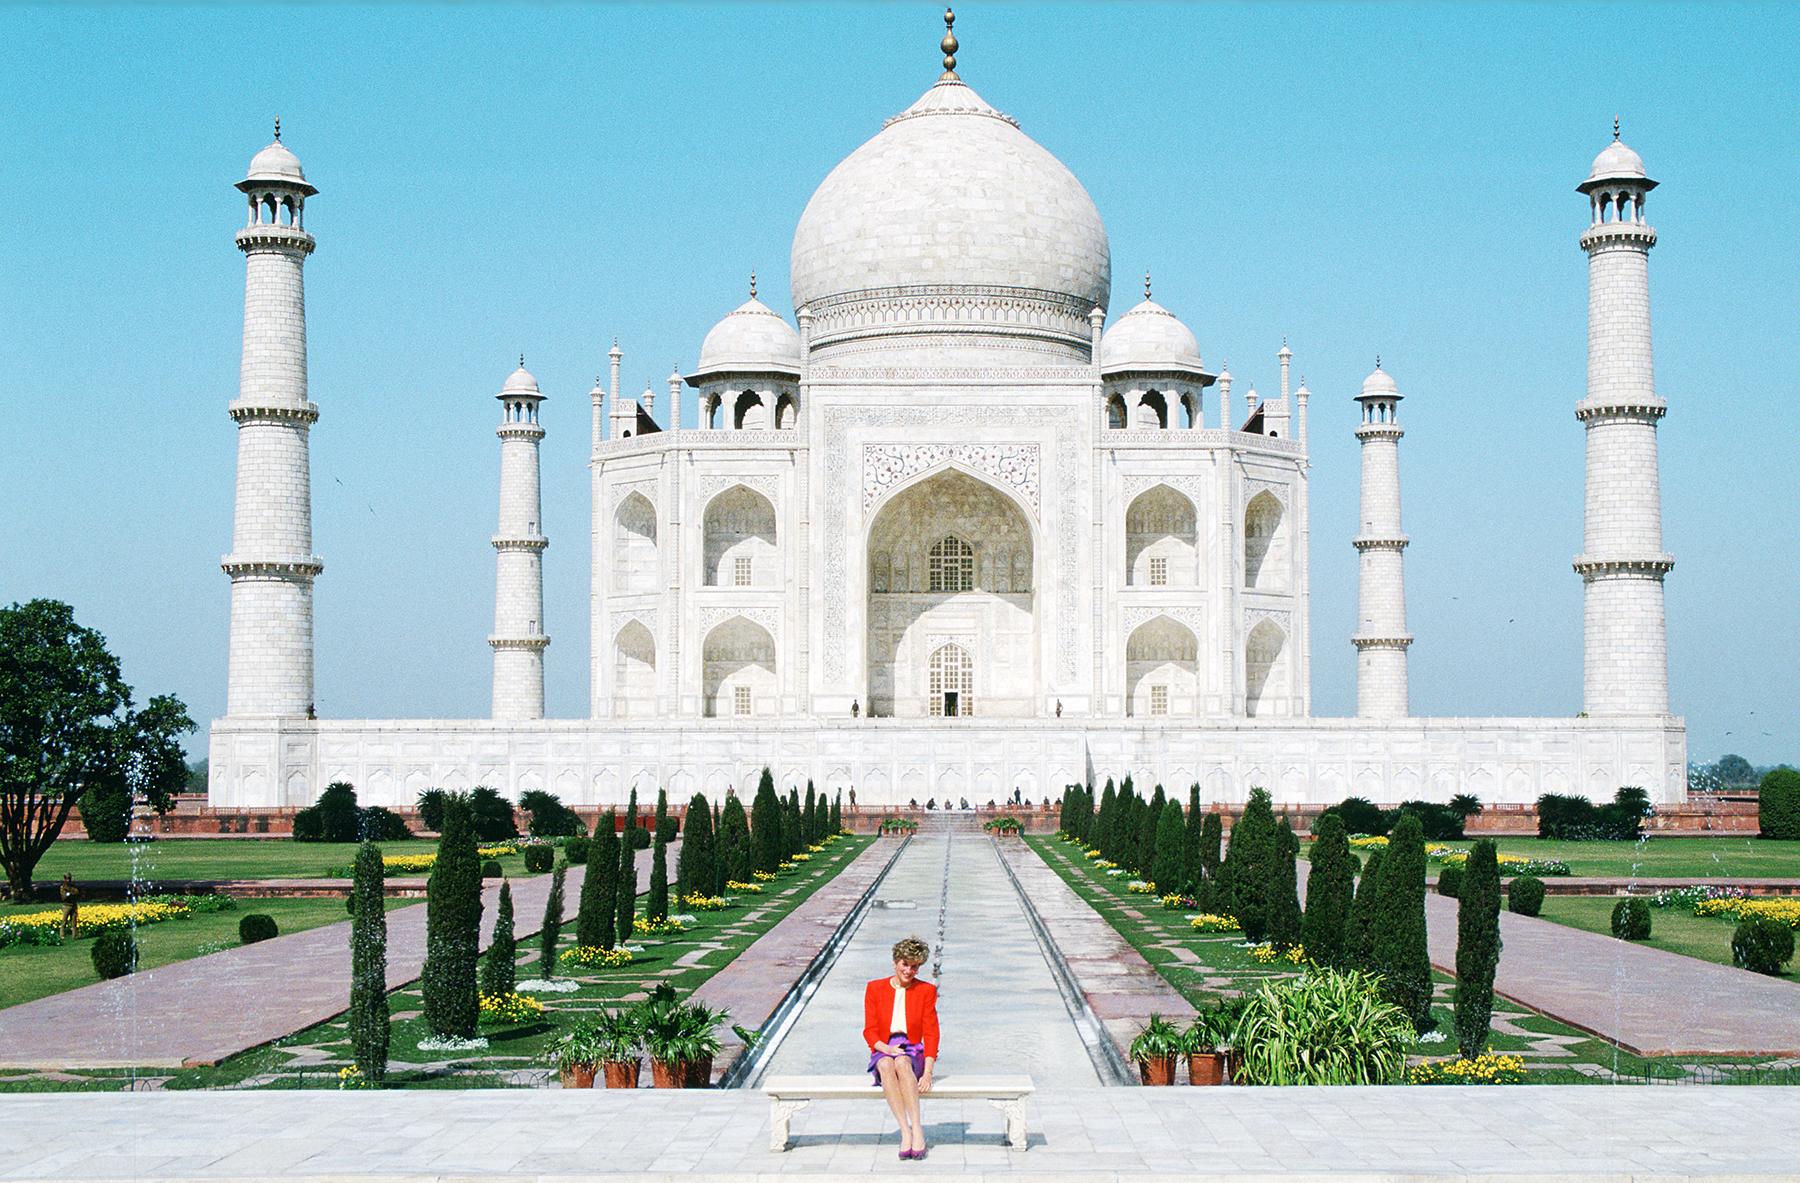 Princess Diana at the Taj Mahal in 1992